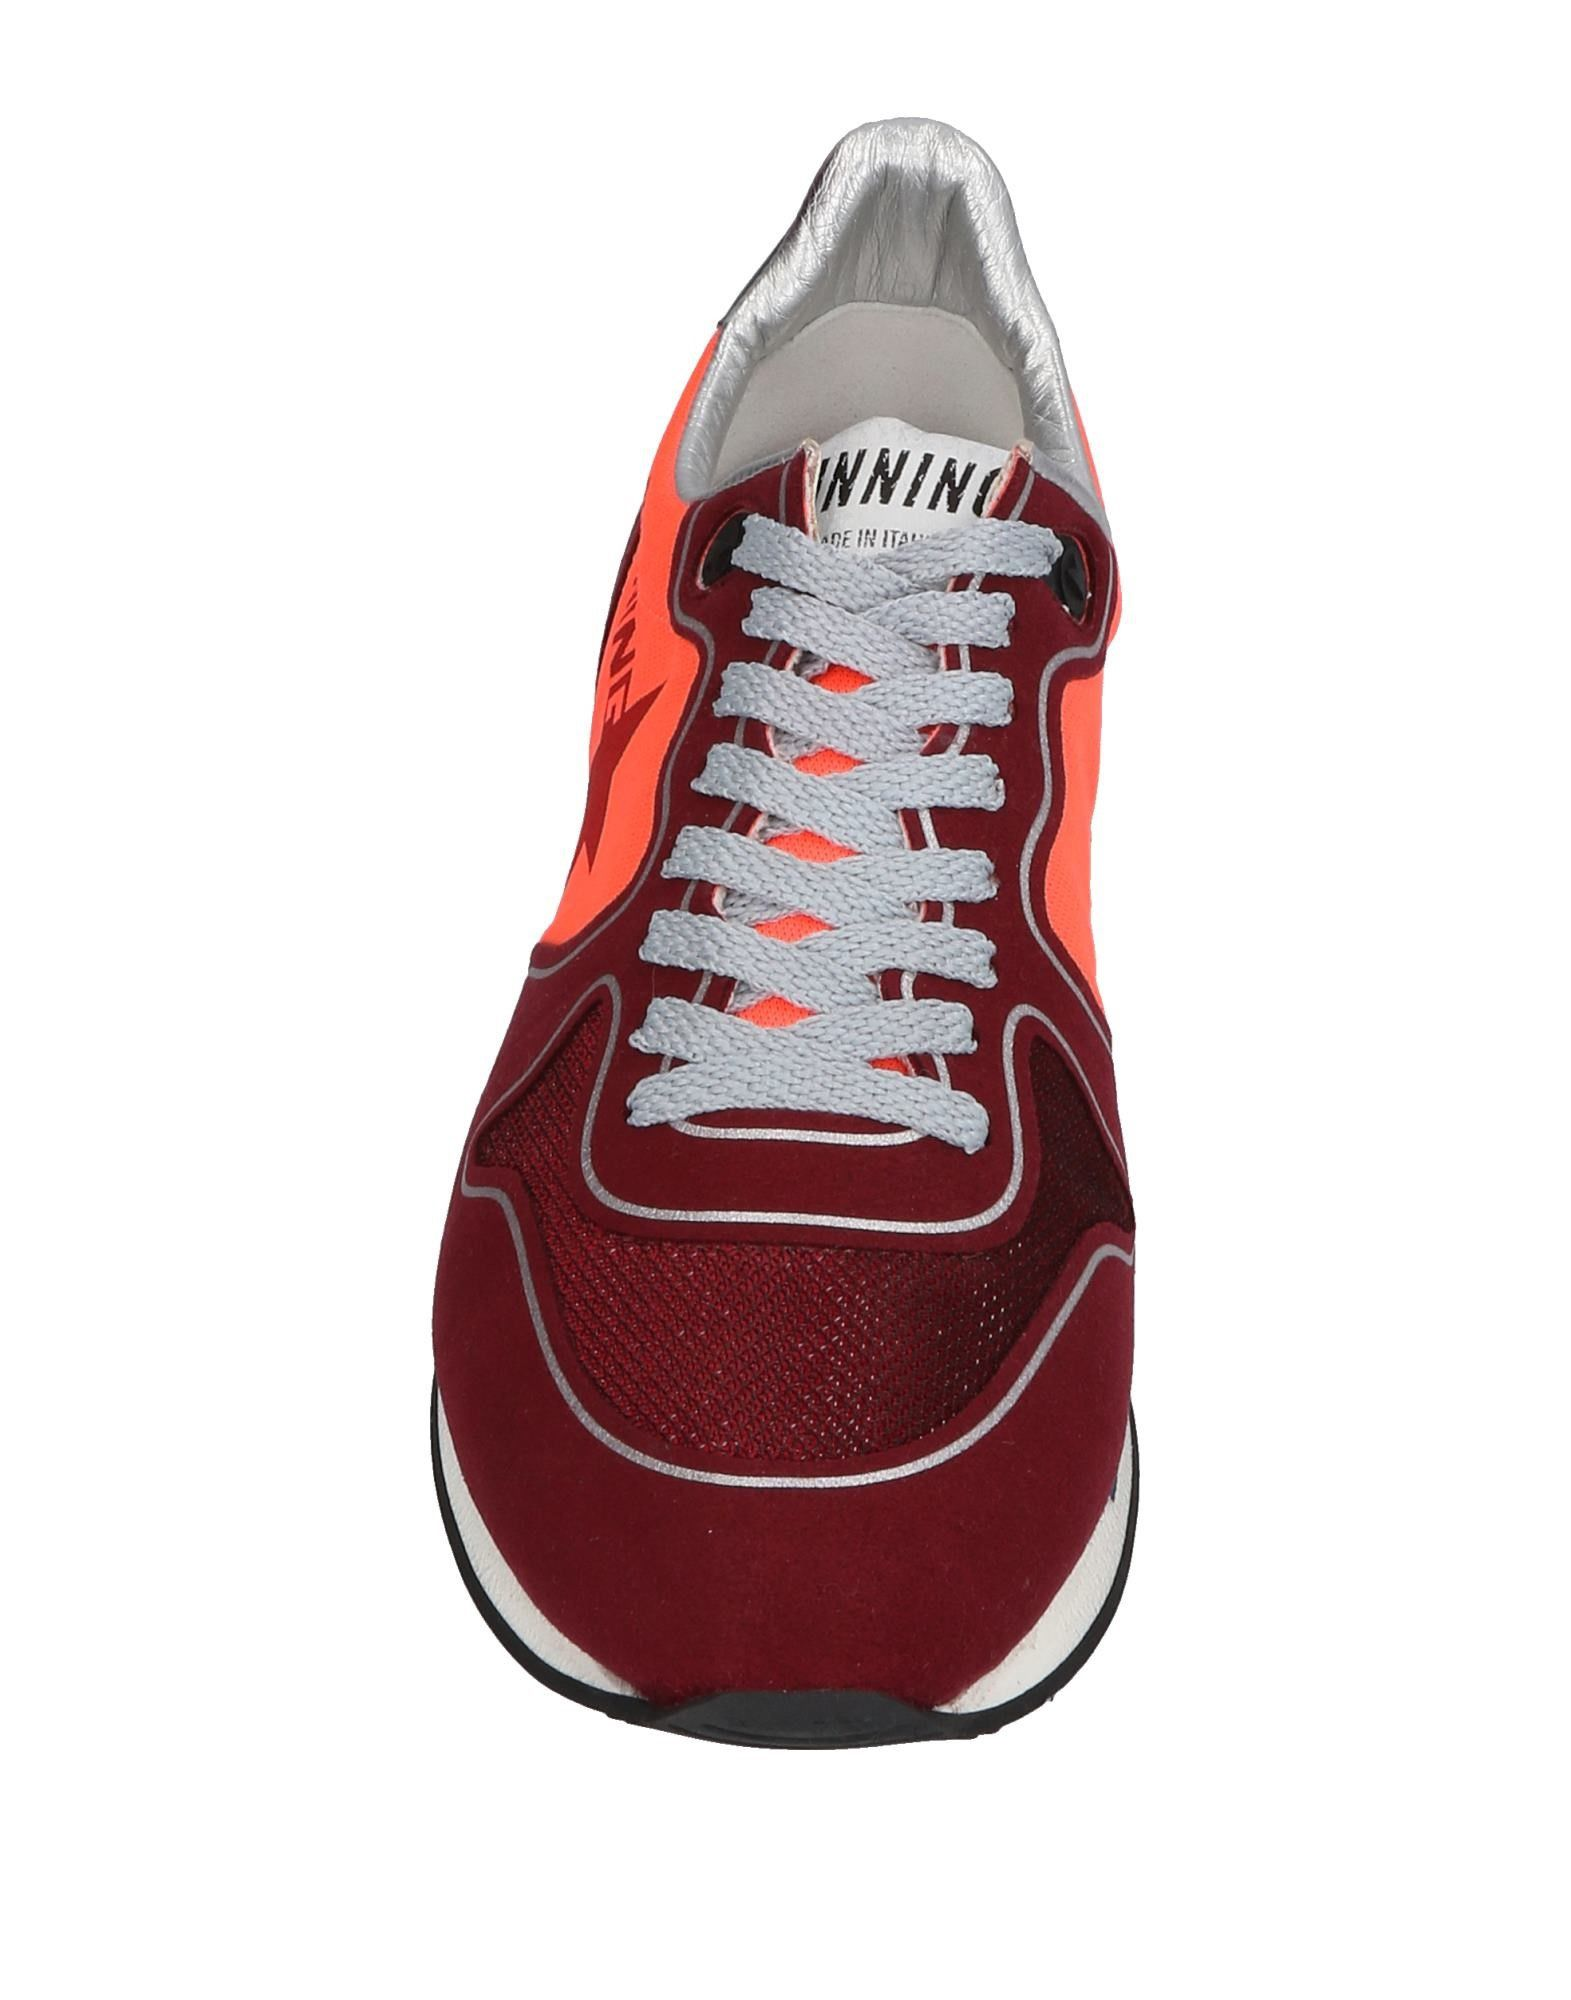 Golden Goose Deluxe Brand Sneakers strapazierfähige Damen  11400070DAGut aussehende strapazierfähige Sneakers Schuhe 72bcad